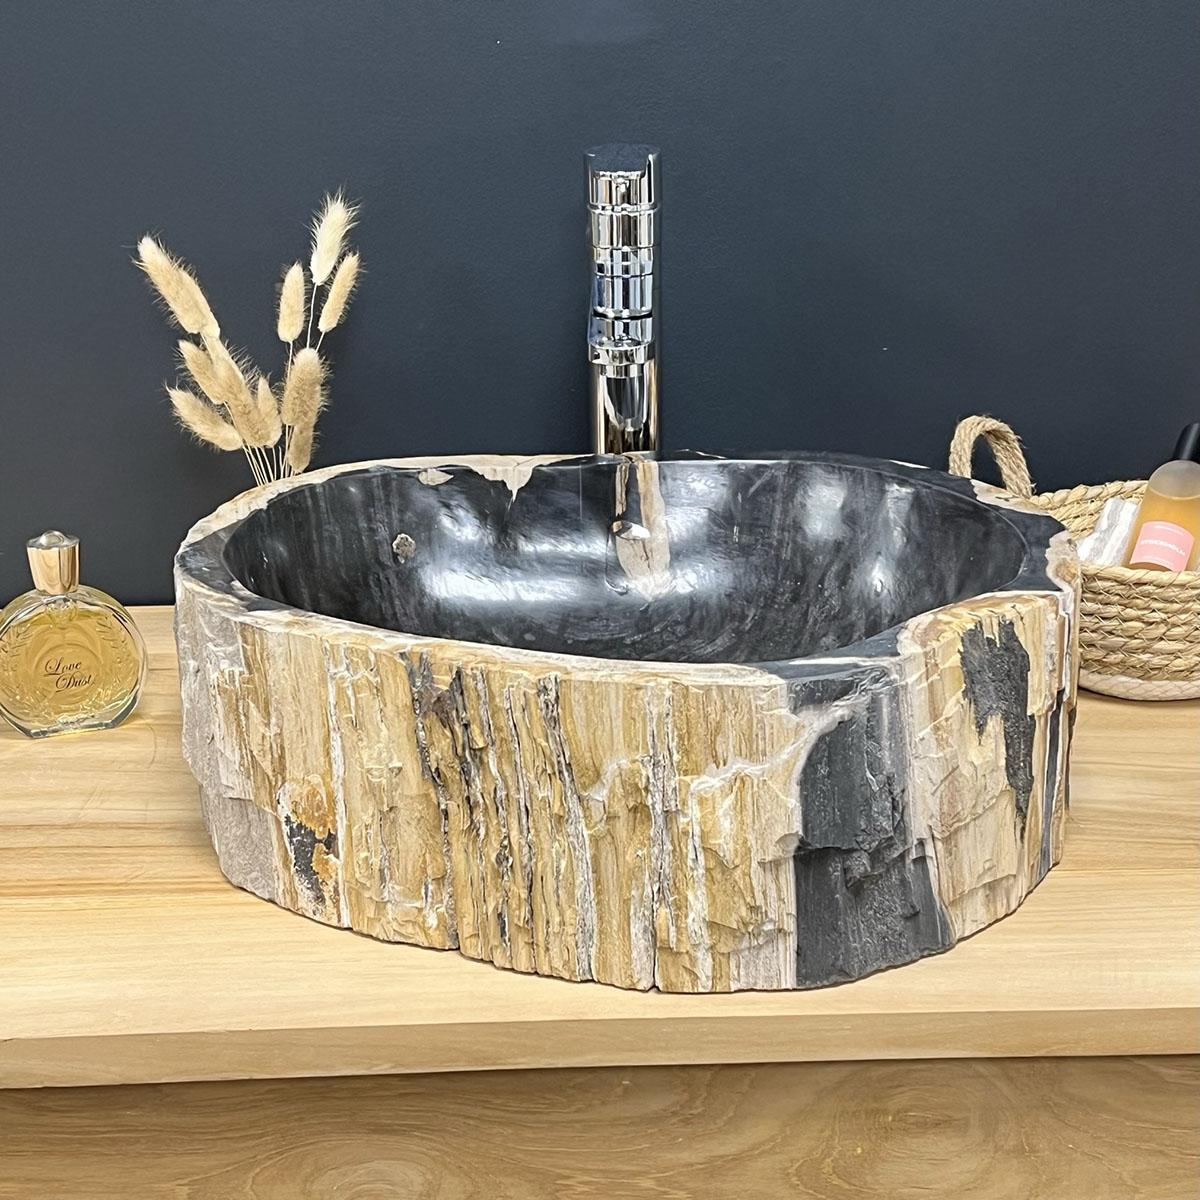 Lavabo de madera : Lavabo encimera de madera petrificada fosilizada ...